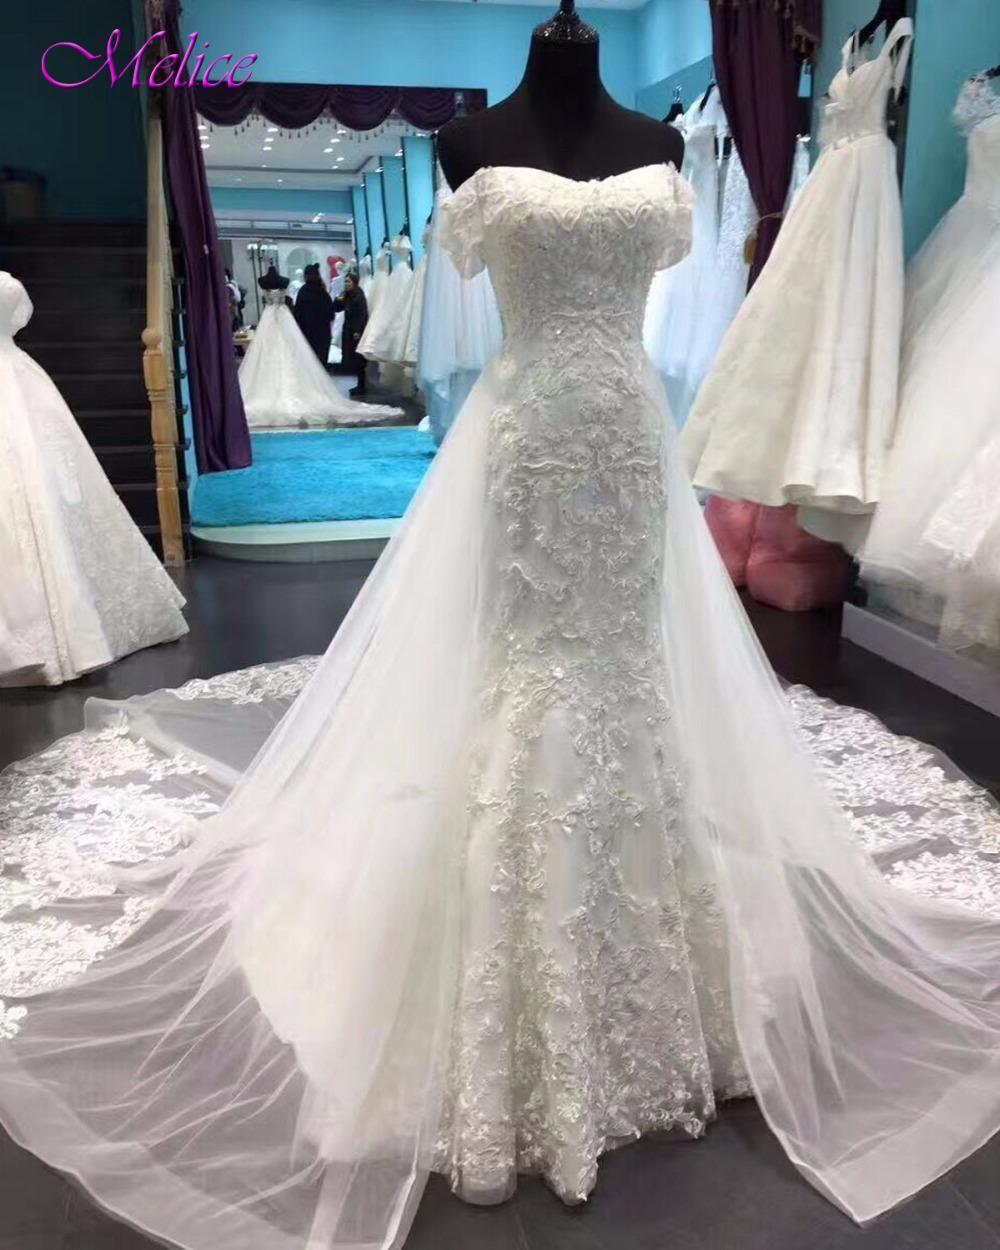 Lace mermaid wedding dress with train  Fmogl Gorgeous Appliques Detachable Train Mermaid Wedding Dress